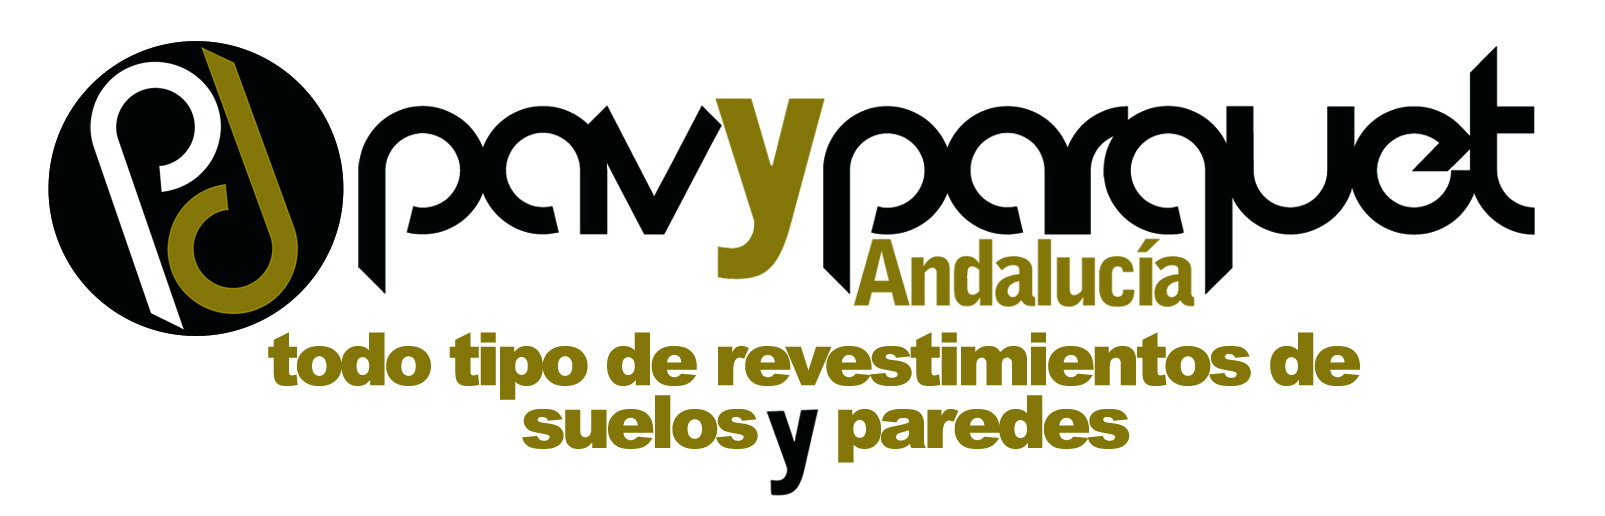 Pavyparquet Andalucía